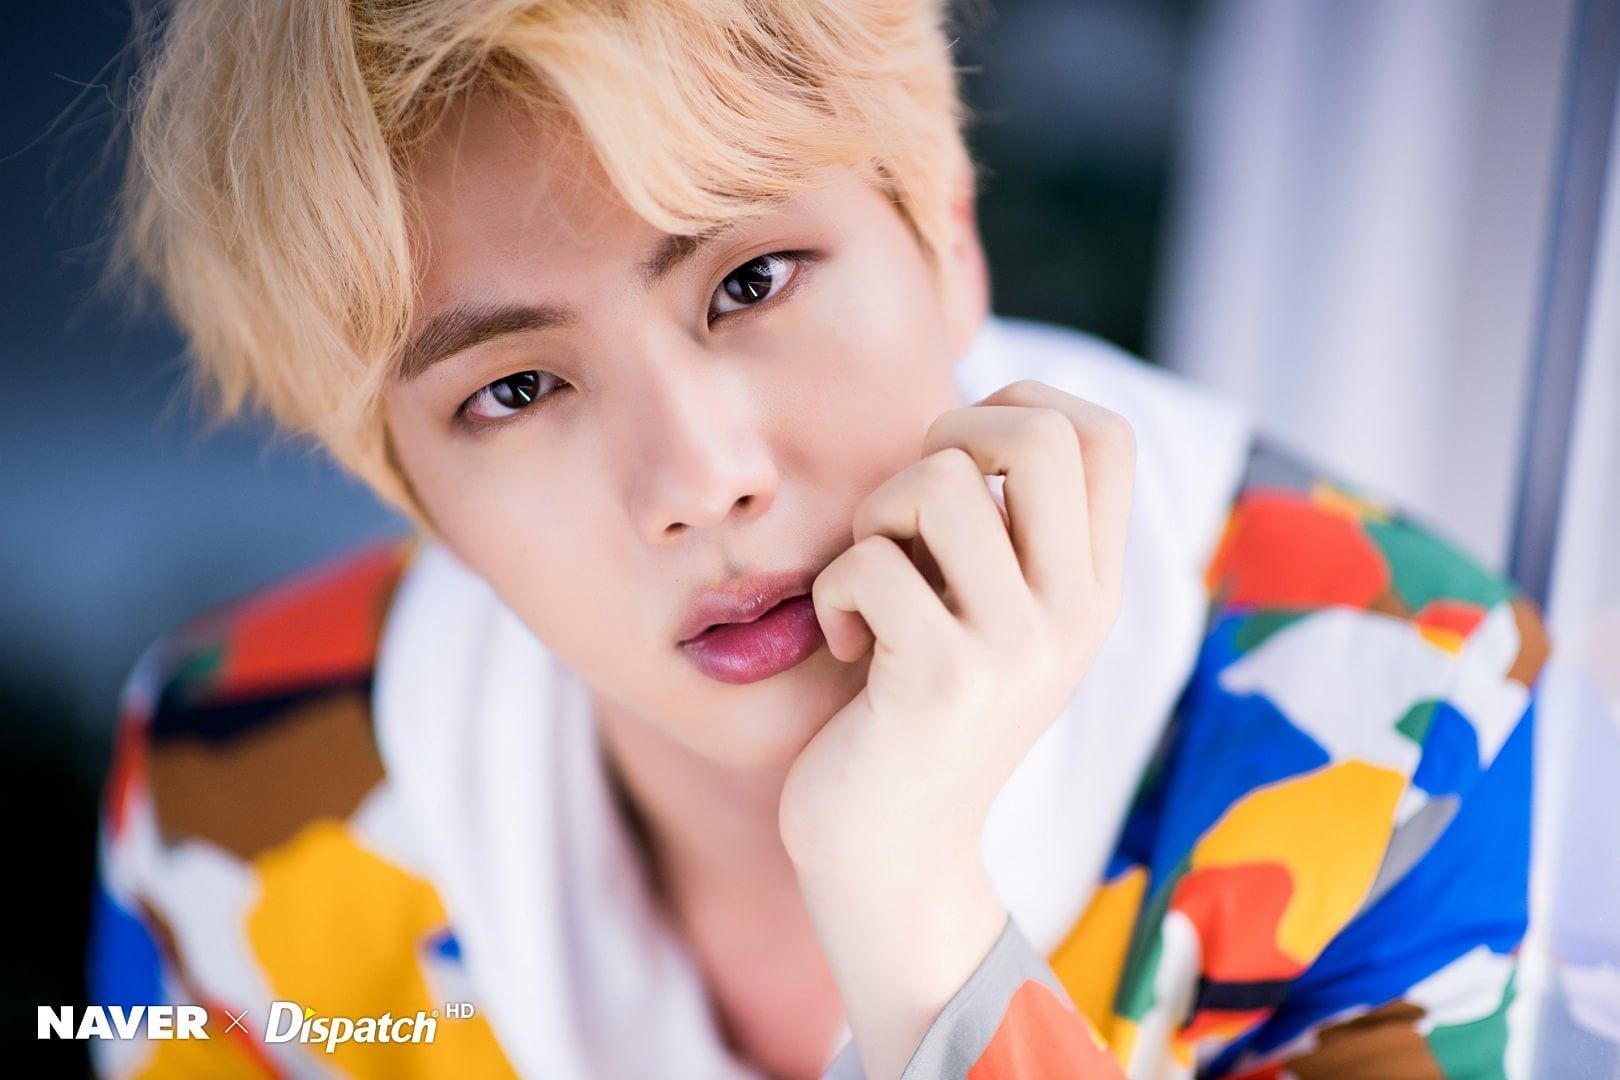 Bts X Dispatch Idol Photoshoot Jin Seokjin Music Kpop Bts Jin Seokjin Idol Photoshoot Btsxdispatch Entertainment Bts Idol